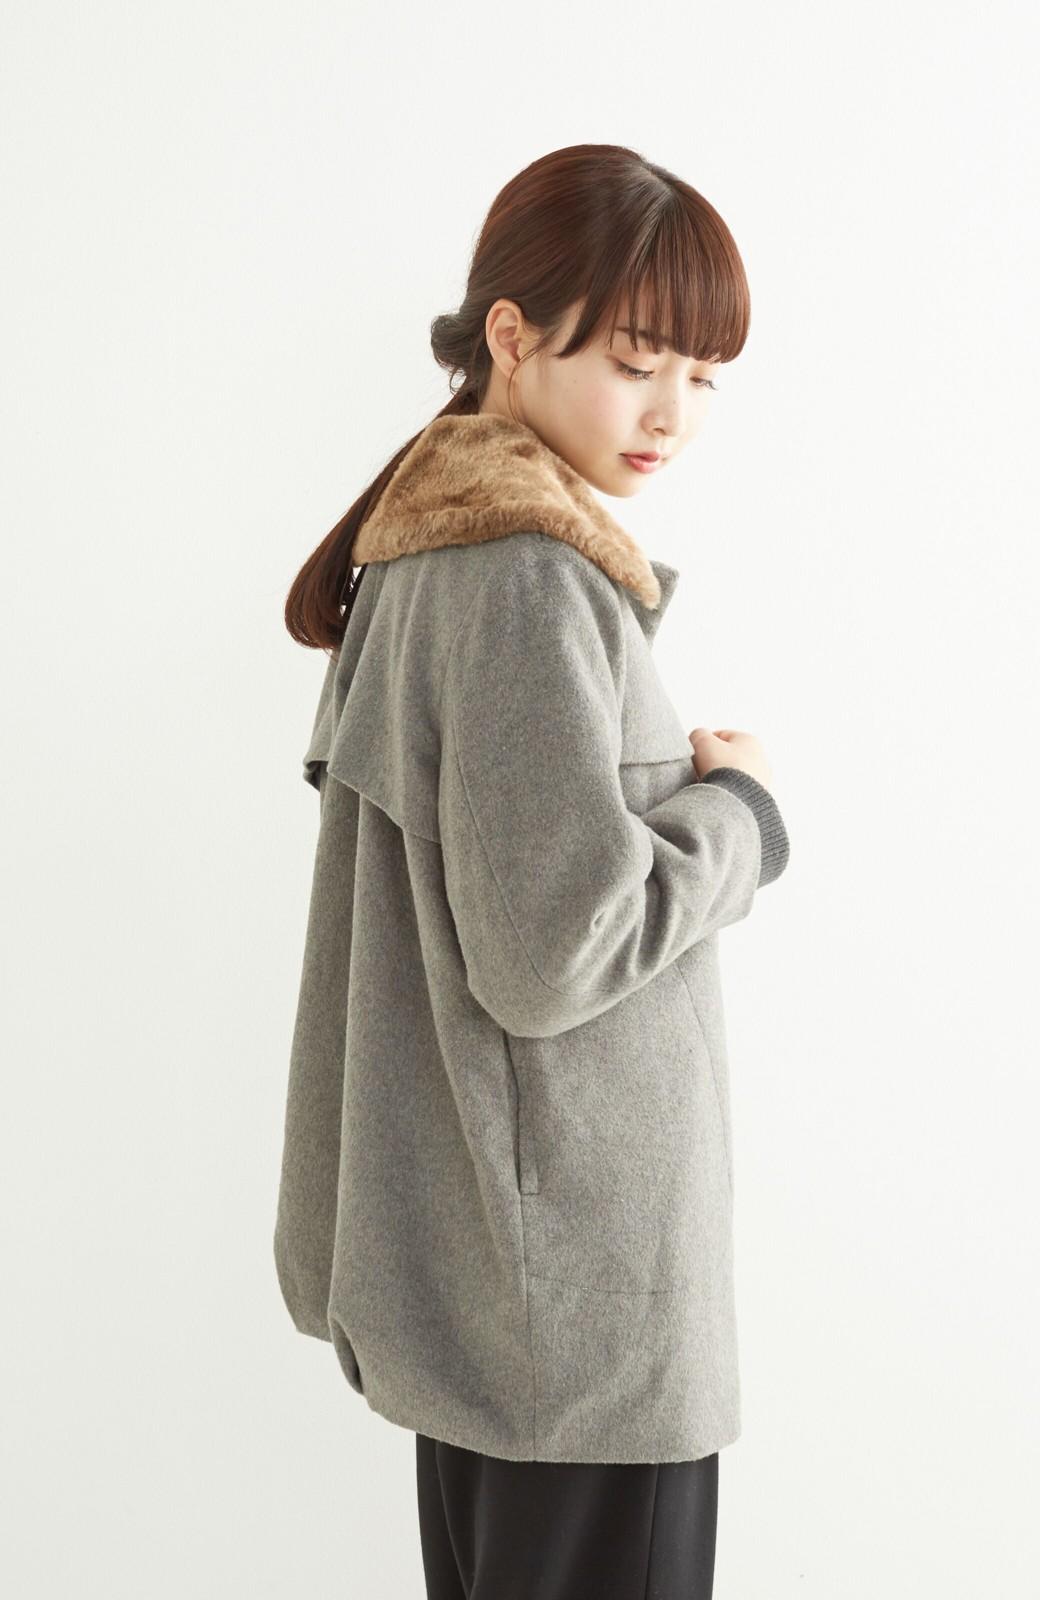 pilvee 取り外しフェイクファー衿付き ウール混のノーカラーコート <グレー>の商品写真17